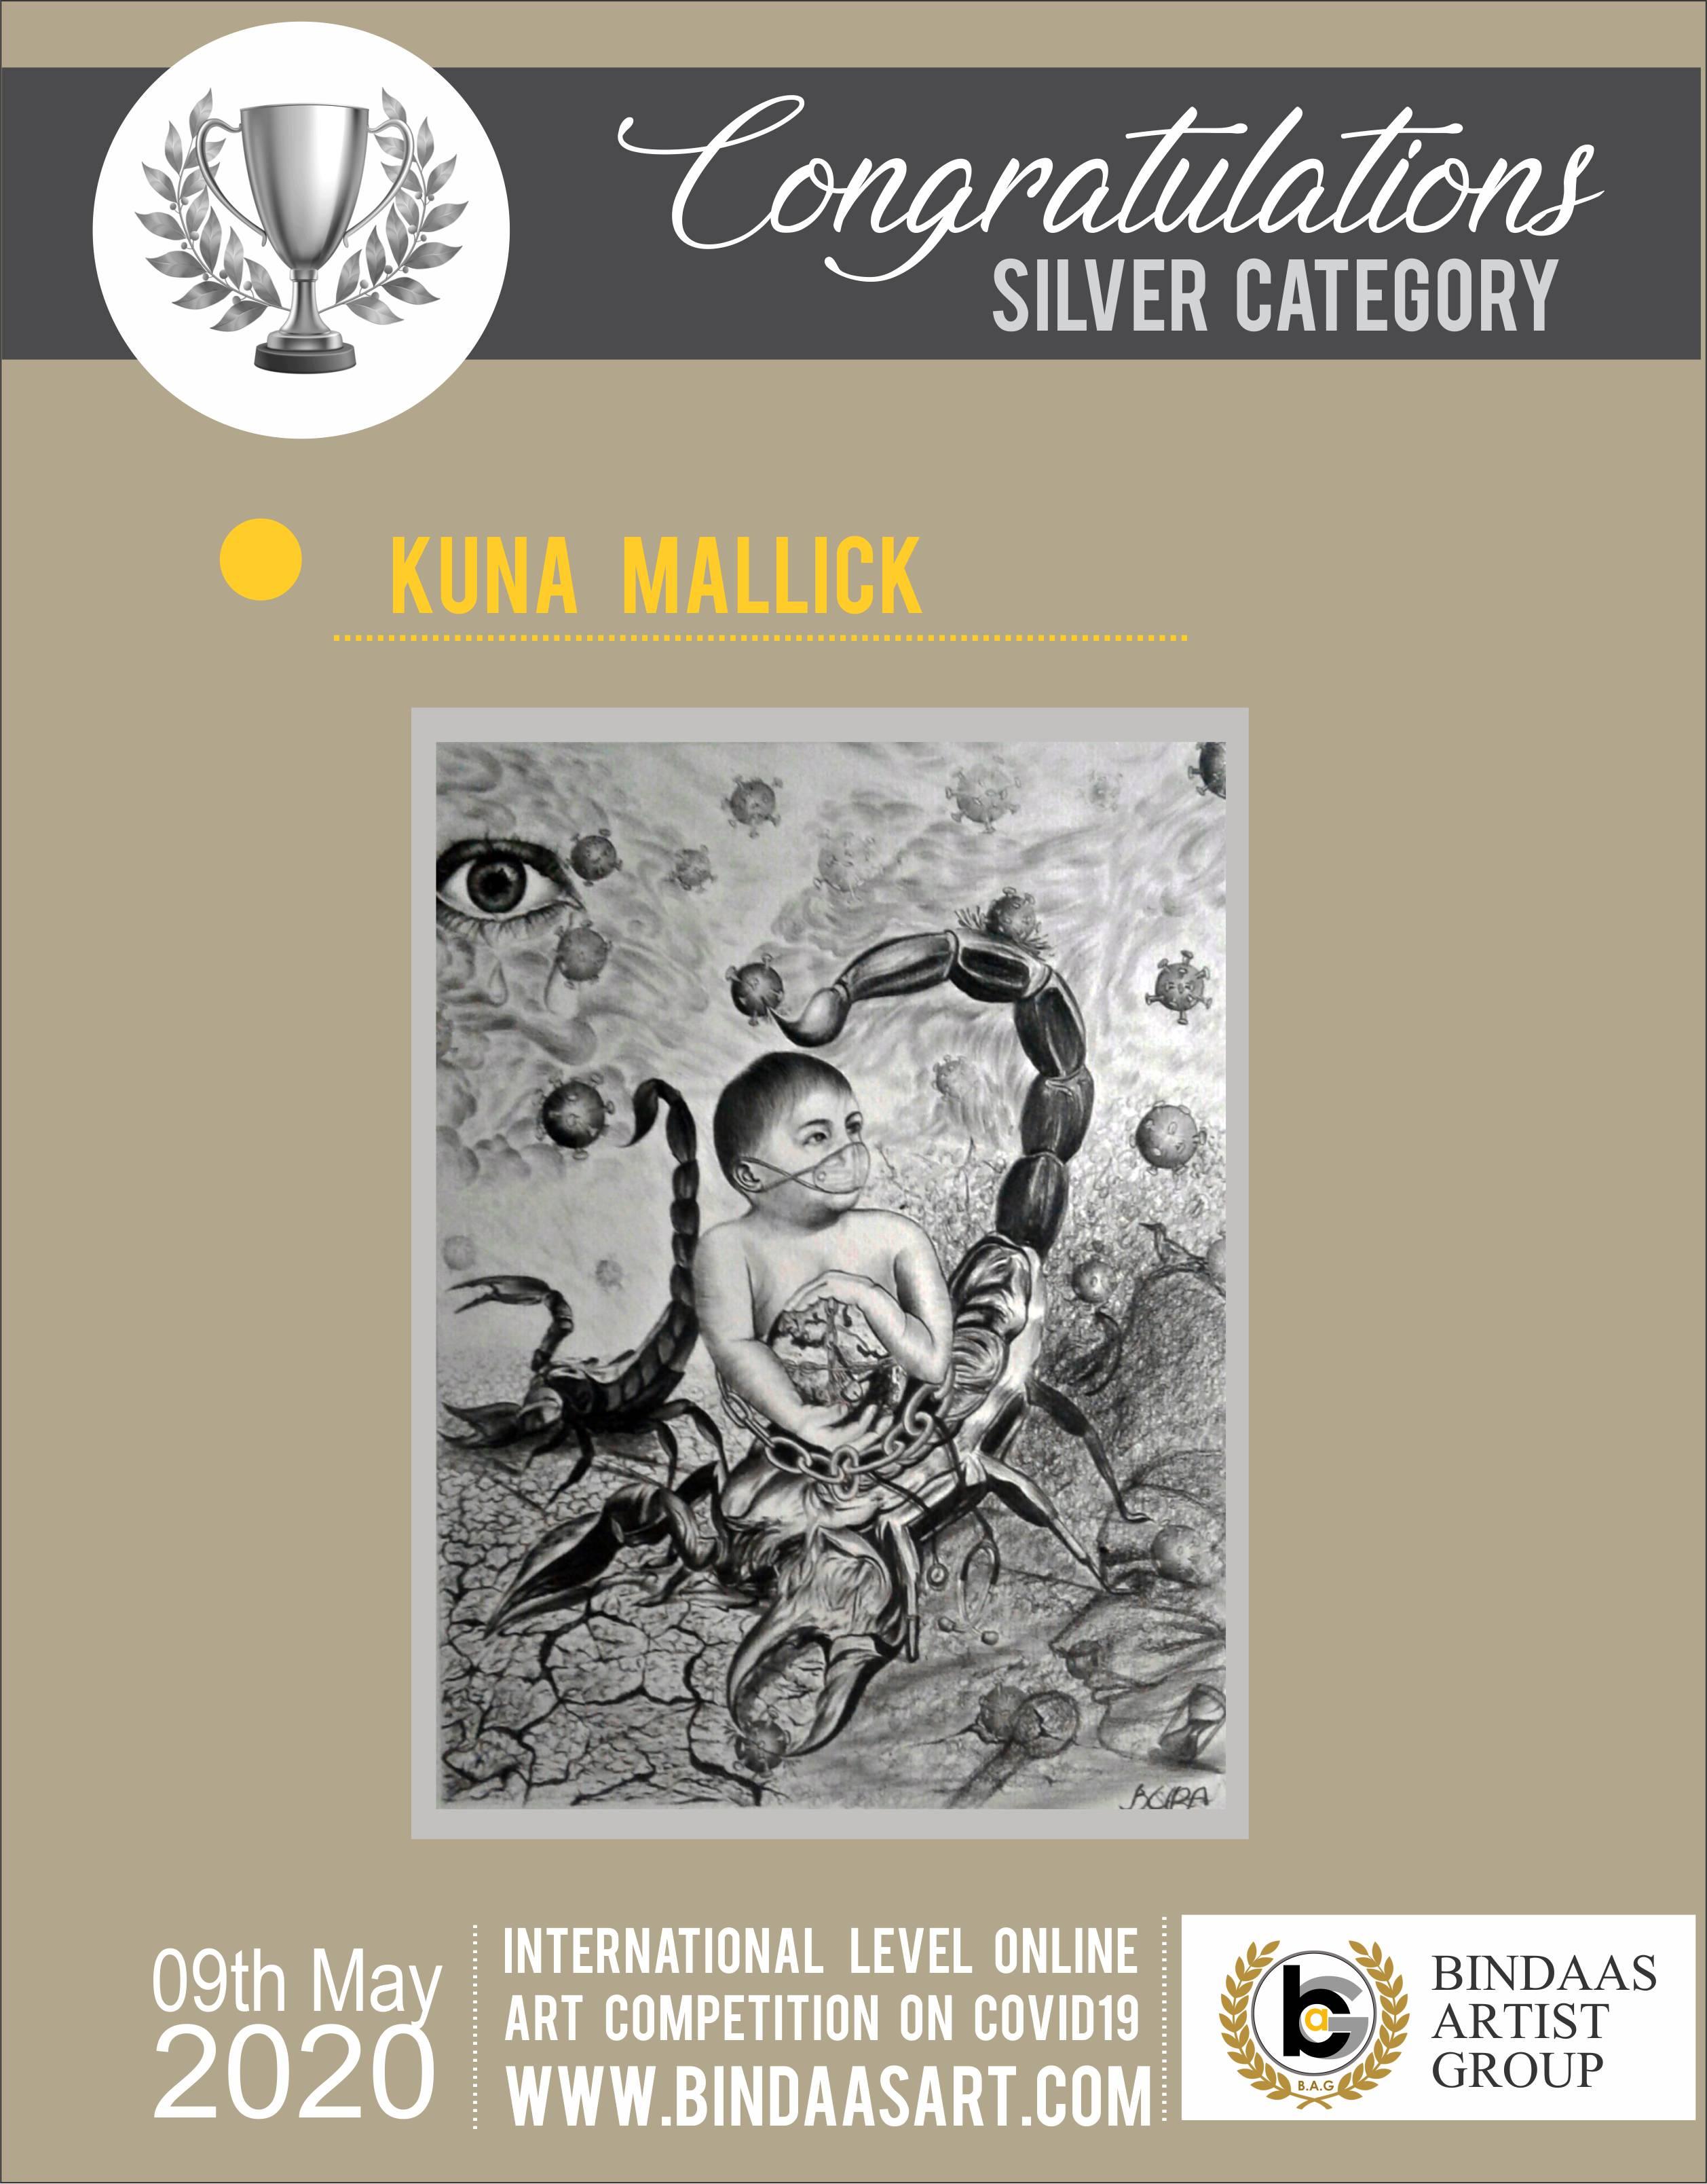 Kuna Mallick